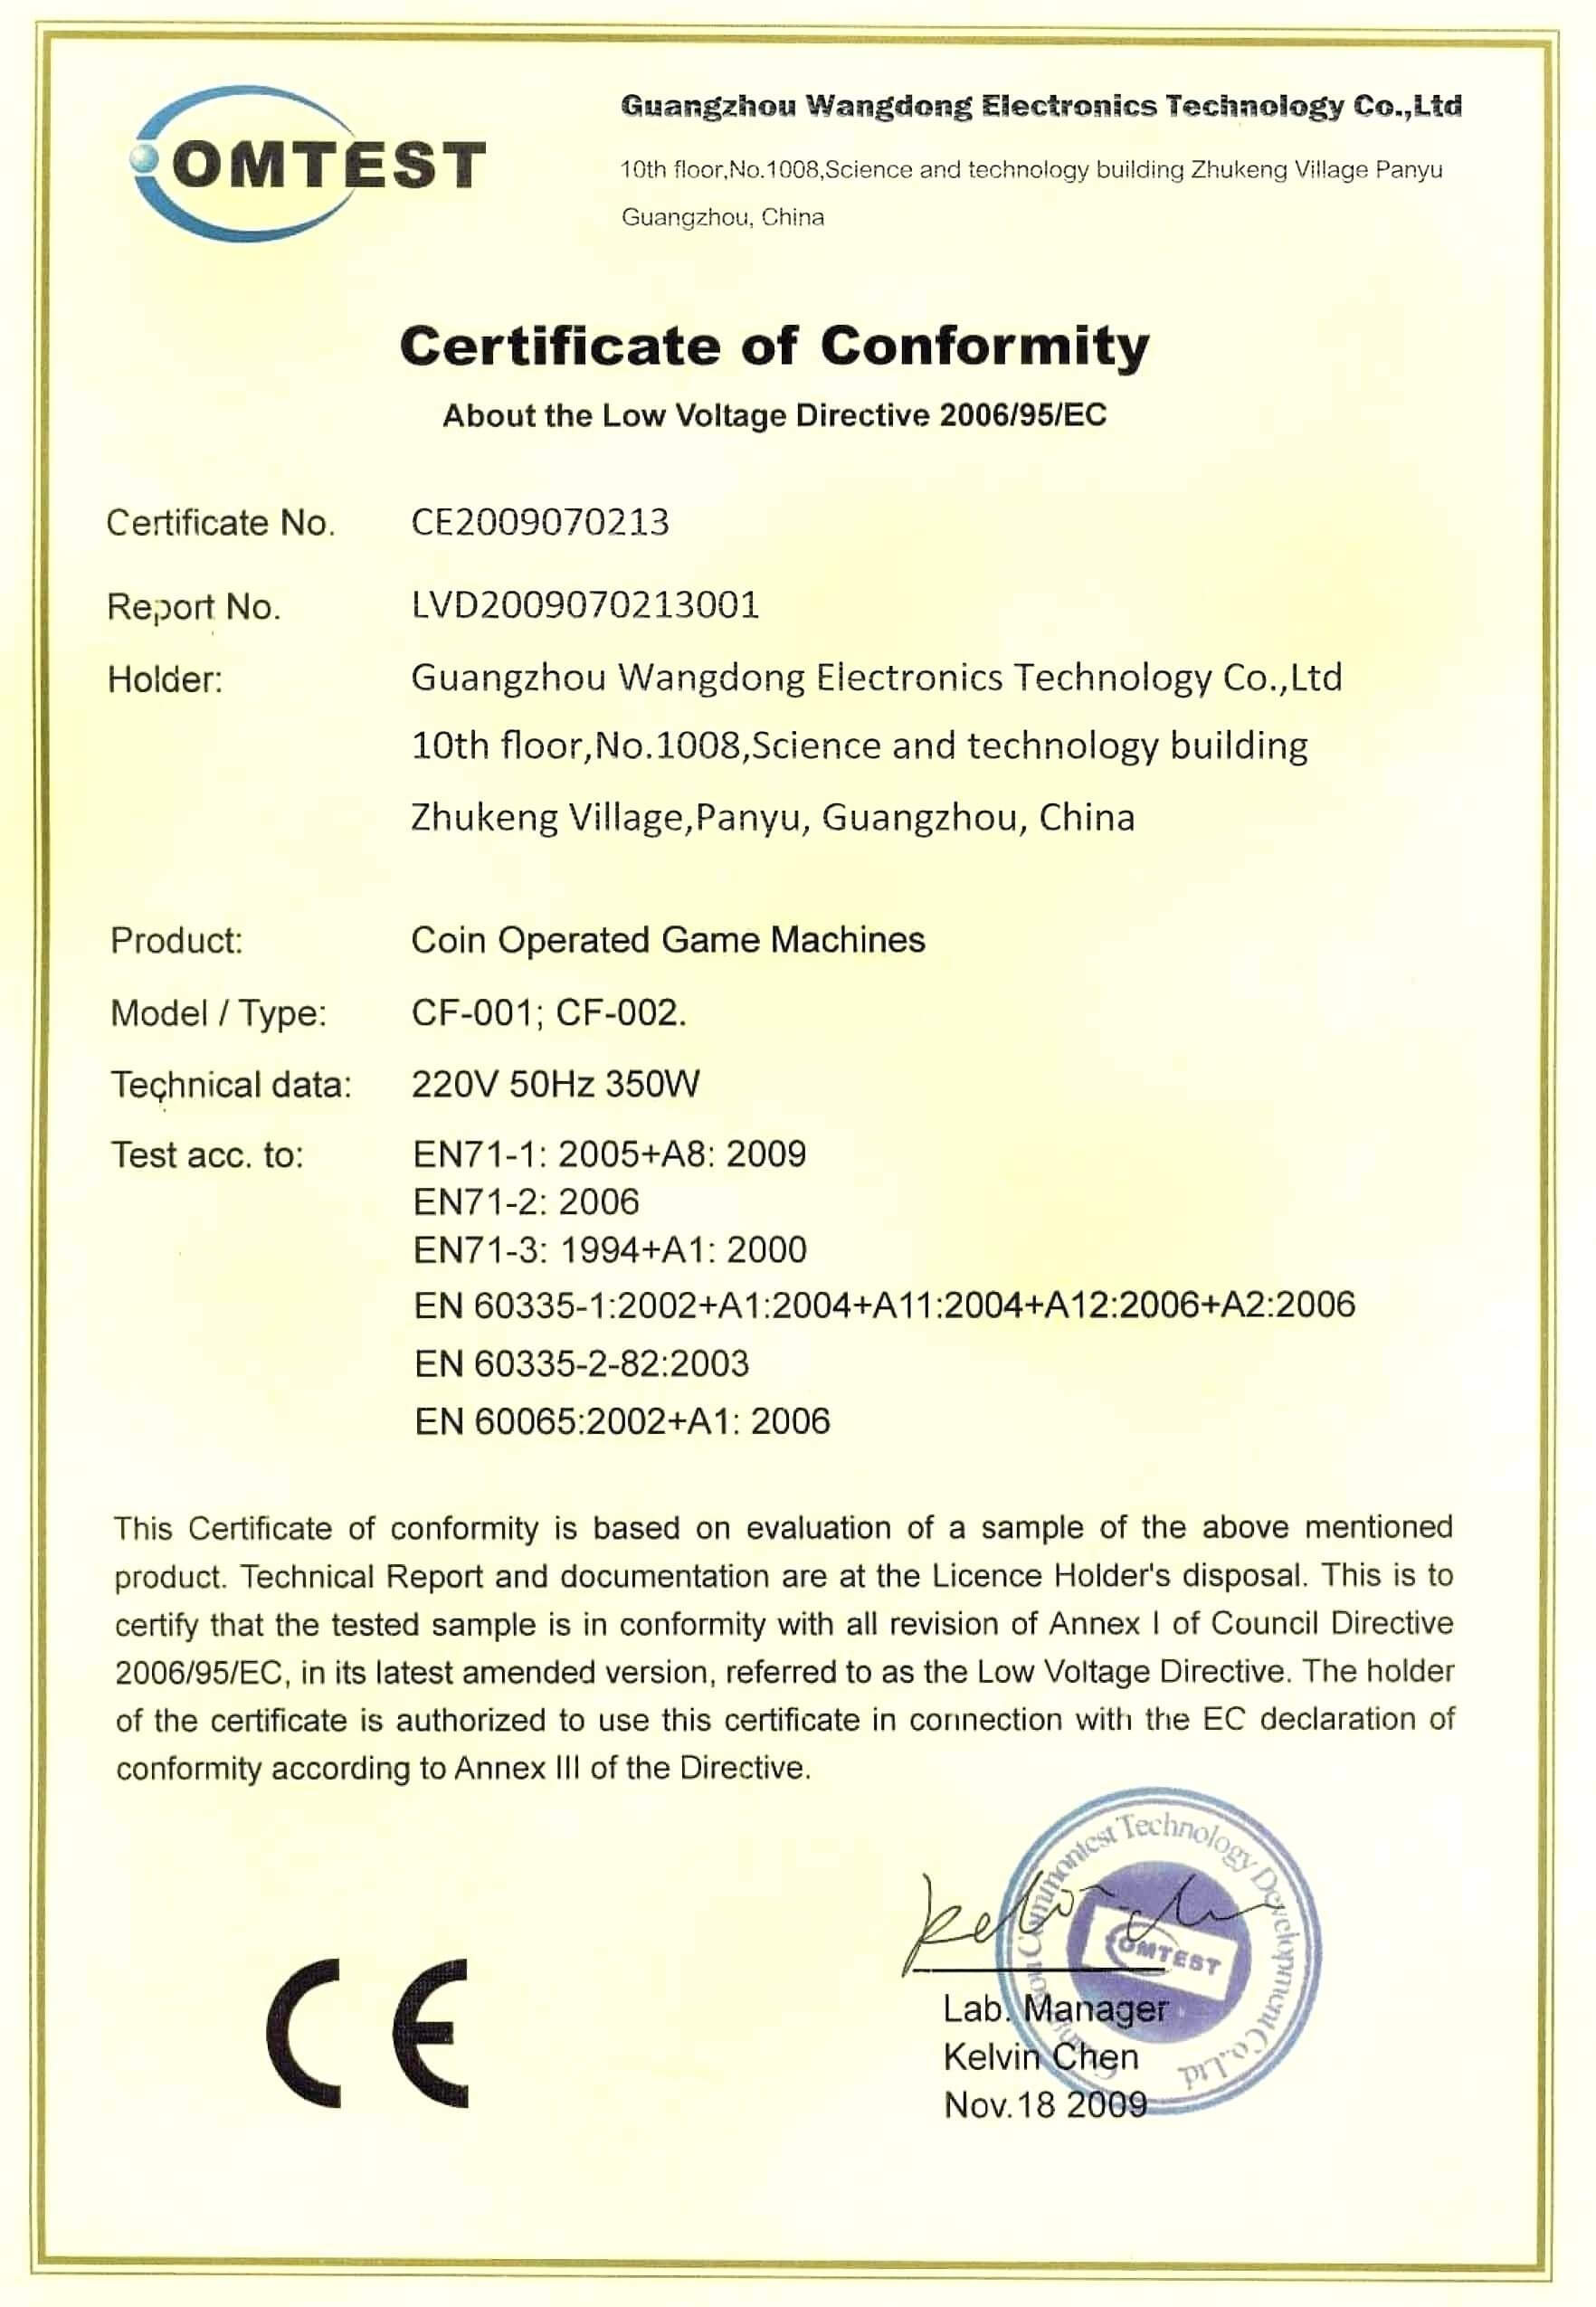 🥰 Blank Printable Certificate Of Conformity [Coc] Form For Certificate Of Conformity Template Free